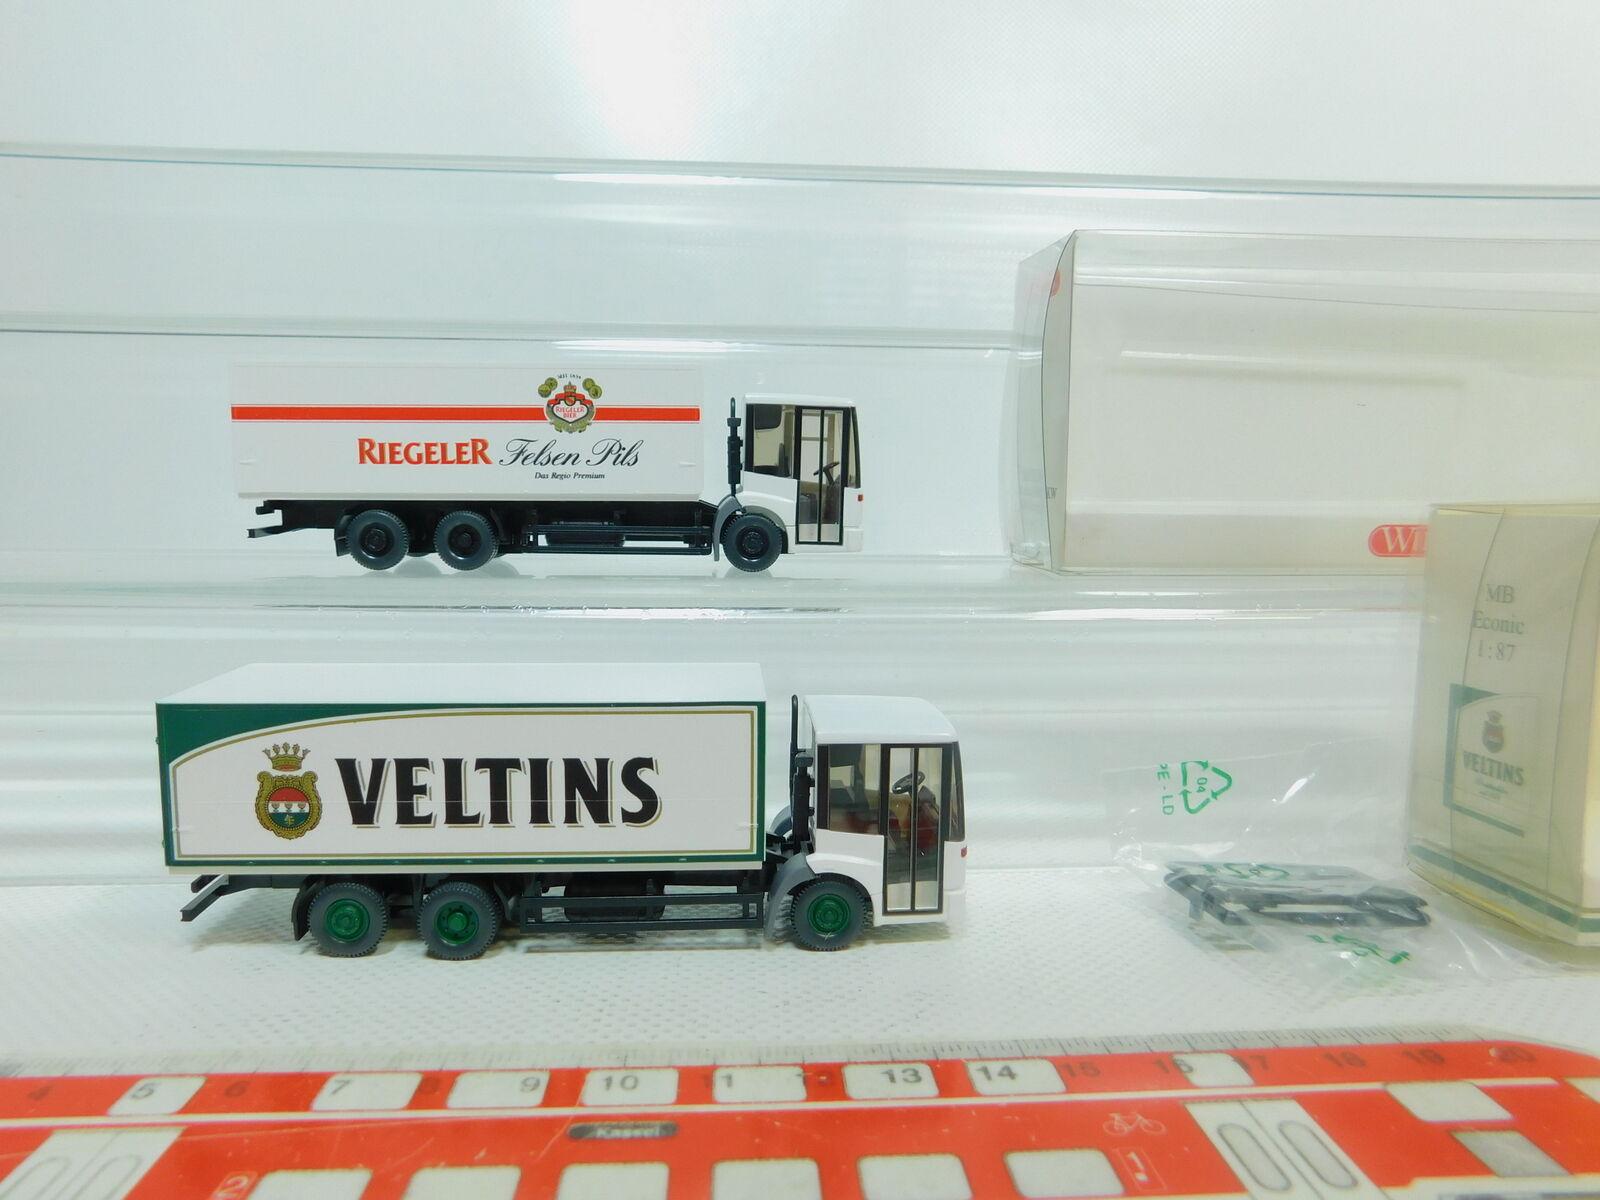 BO831-0,5x BO831-0,5x BO831-0,5x Wiking H0 1 87 Getränkekoffer LKW MB  561 + Veltins, sehr gut+OVP b89dee